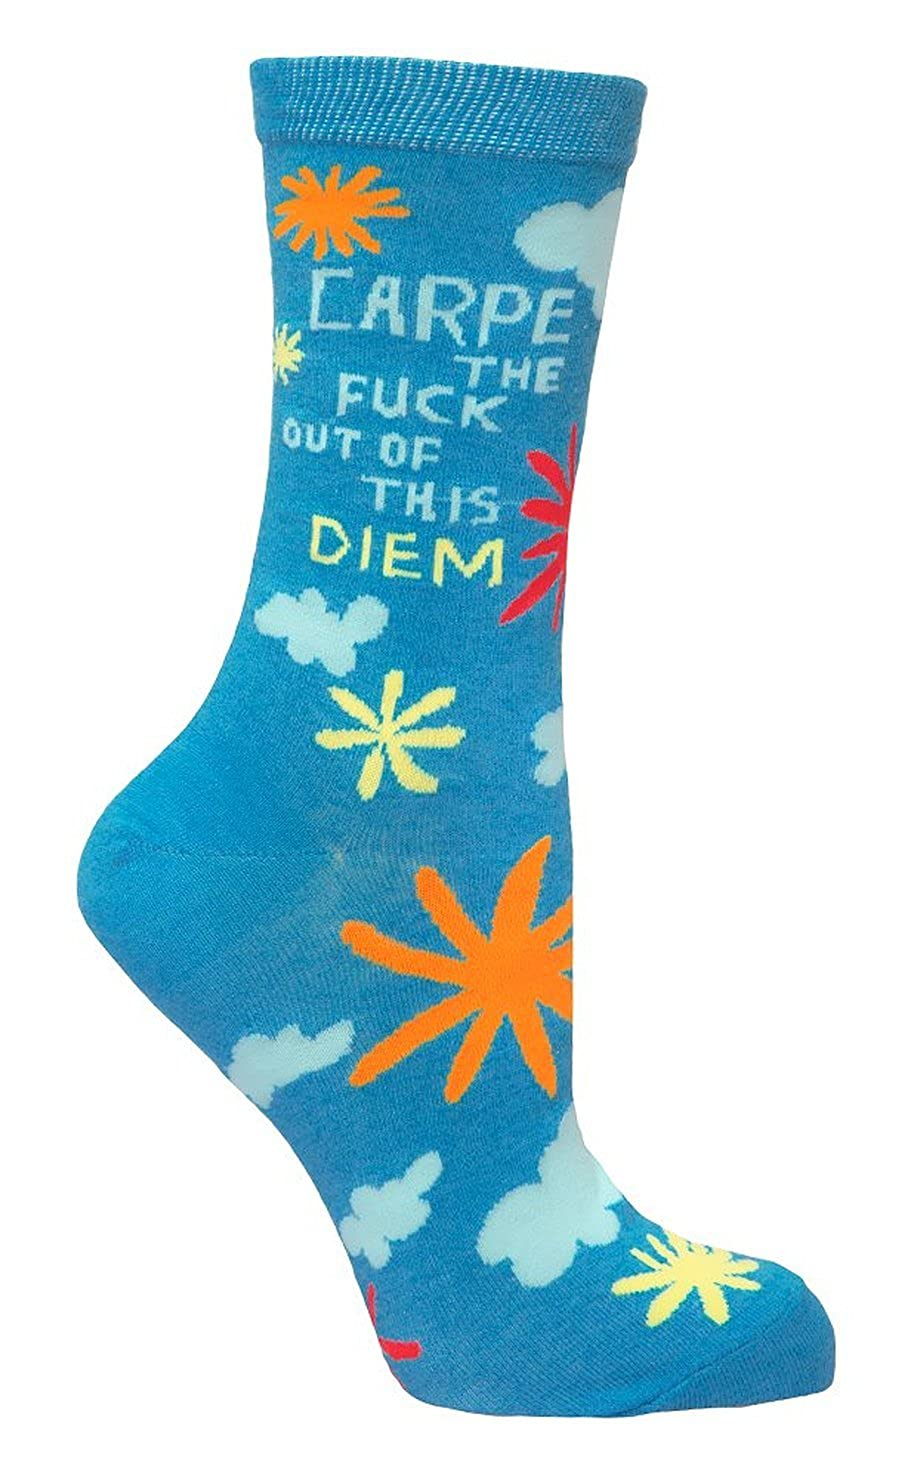 Blue Q Crew Socks SW415